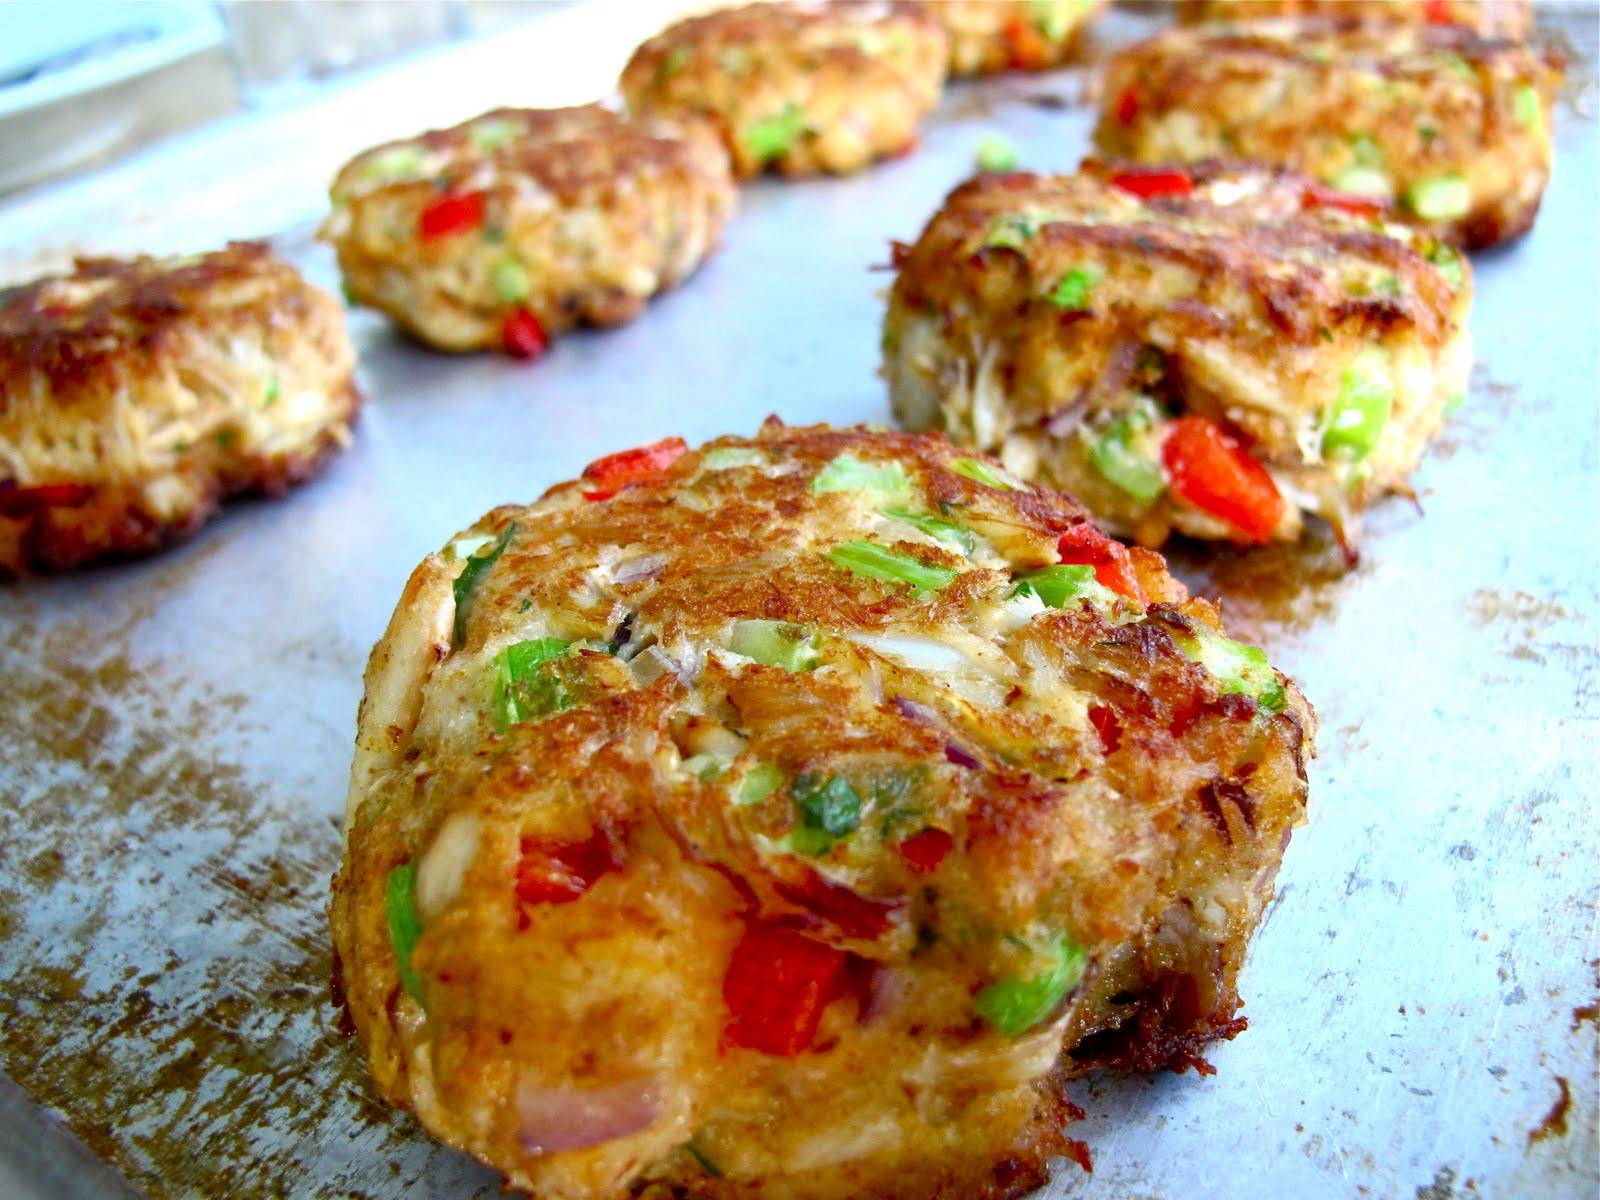 Crab Cake Recipe Panko  Jenny Steffens Hobick Crab Cakes with Panko Bread Crumbs